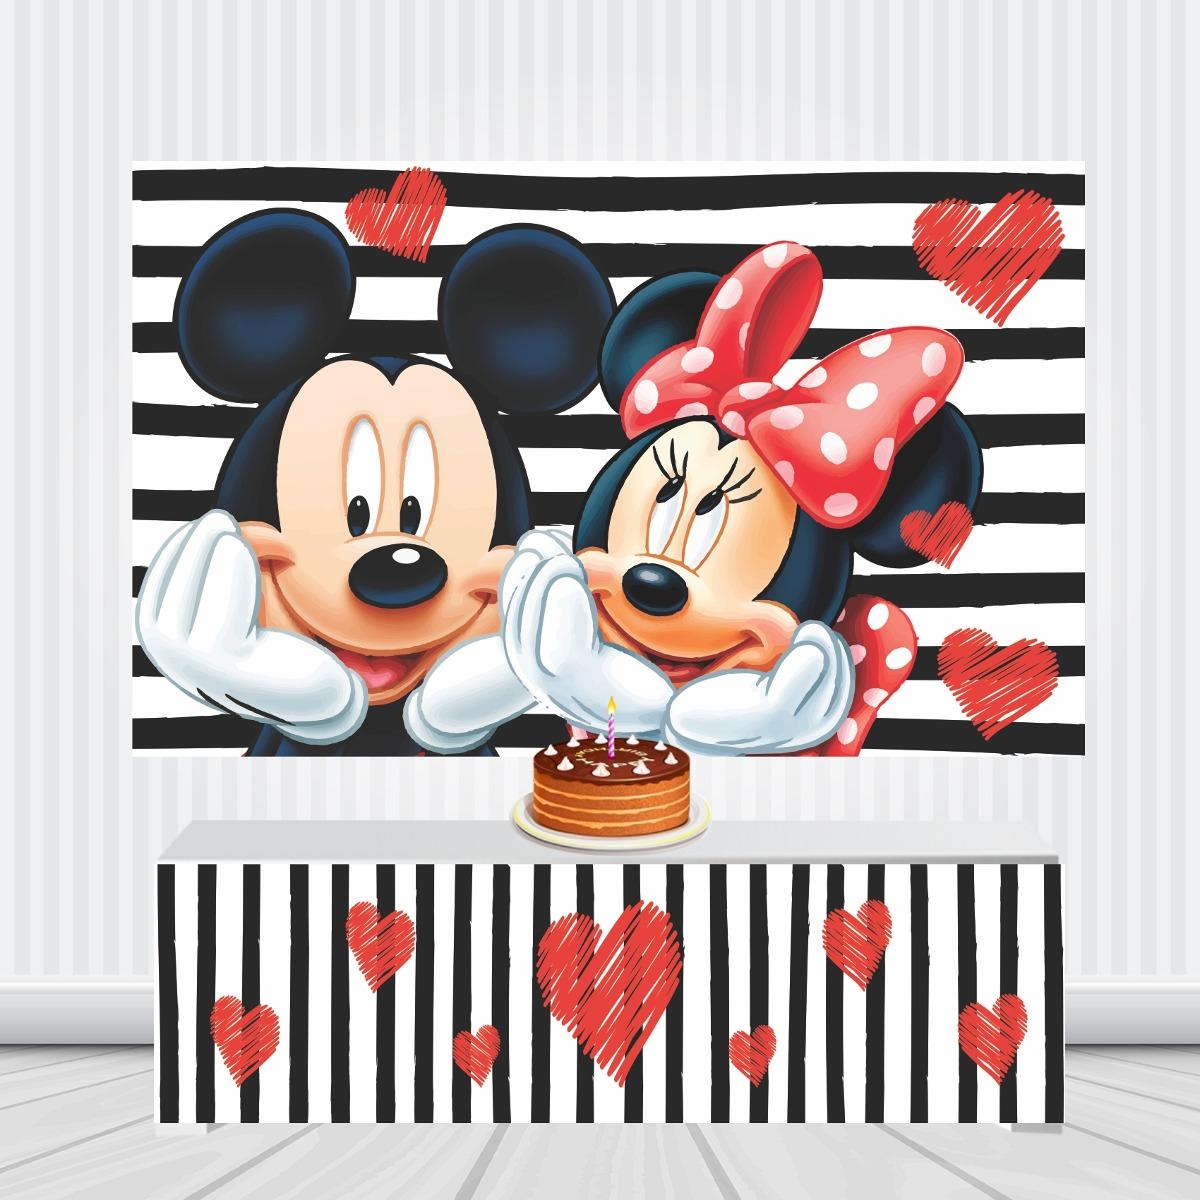 Painel Mickey E Minnie Listras 2 5por1 5m Frente Da Mesa R